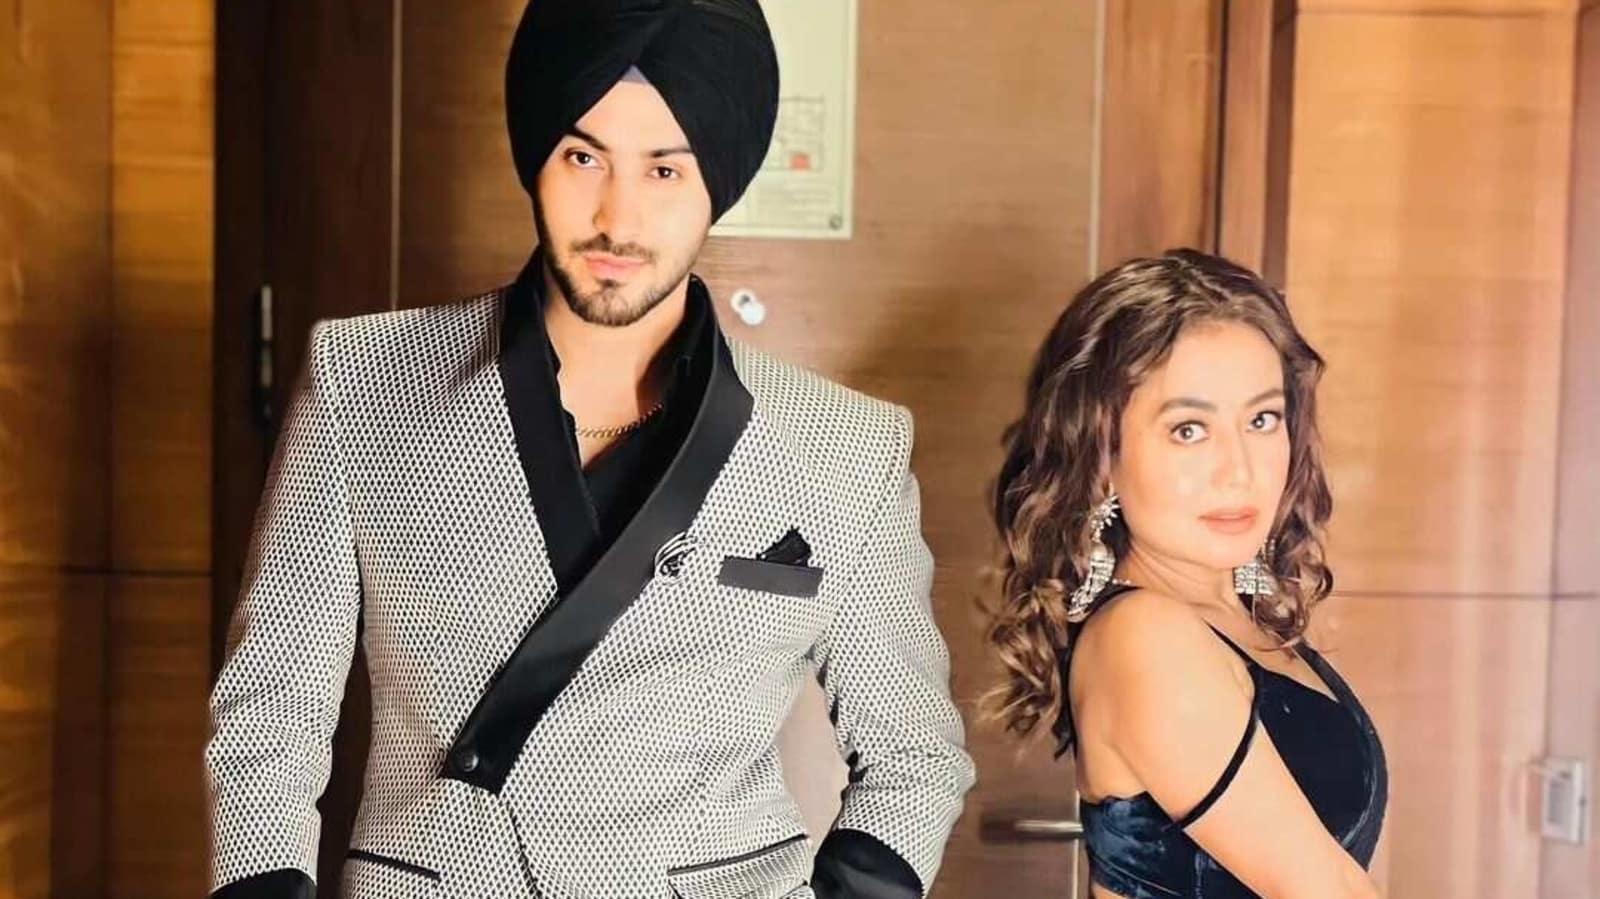 Rohanpreet Singh cannot get over Neha Kakkar's 'hotness' in glamorous new photos - Hindustan Times